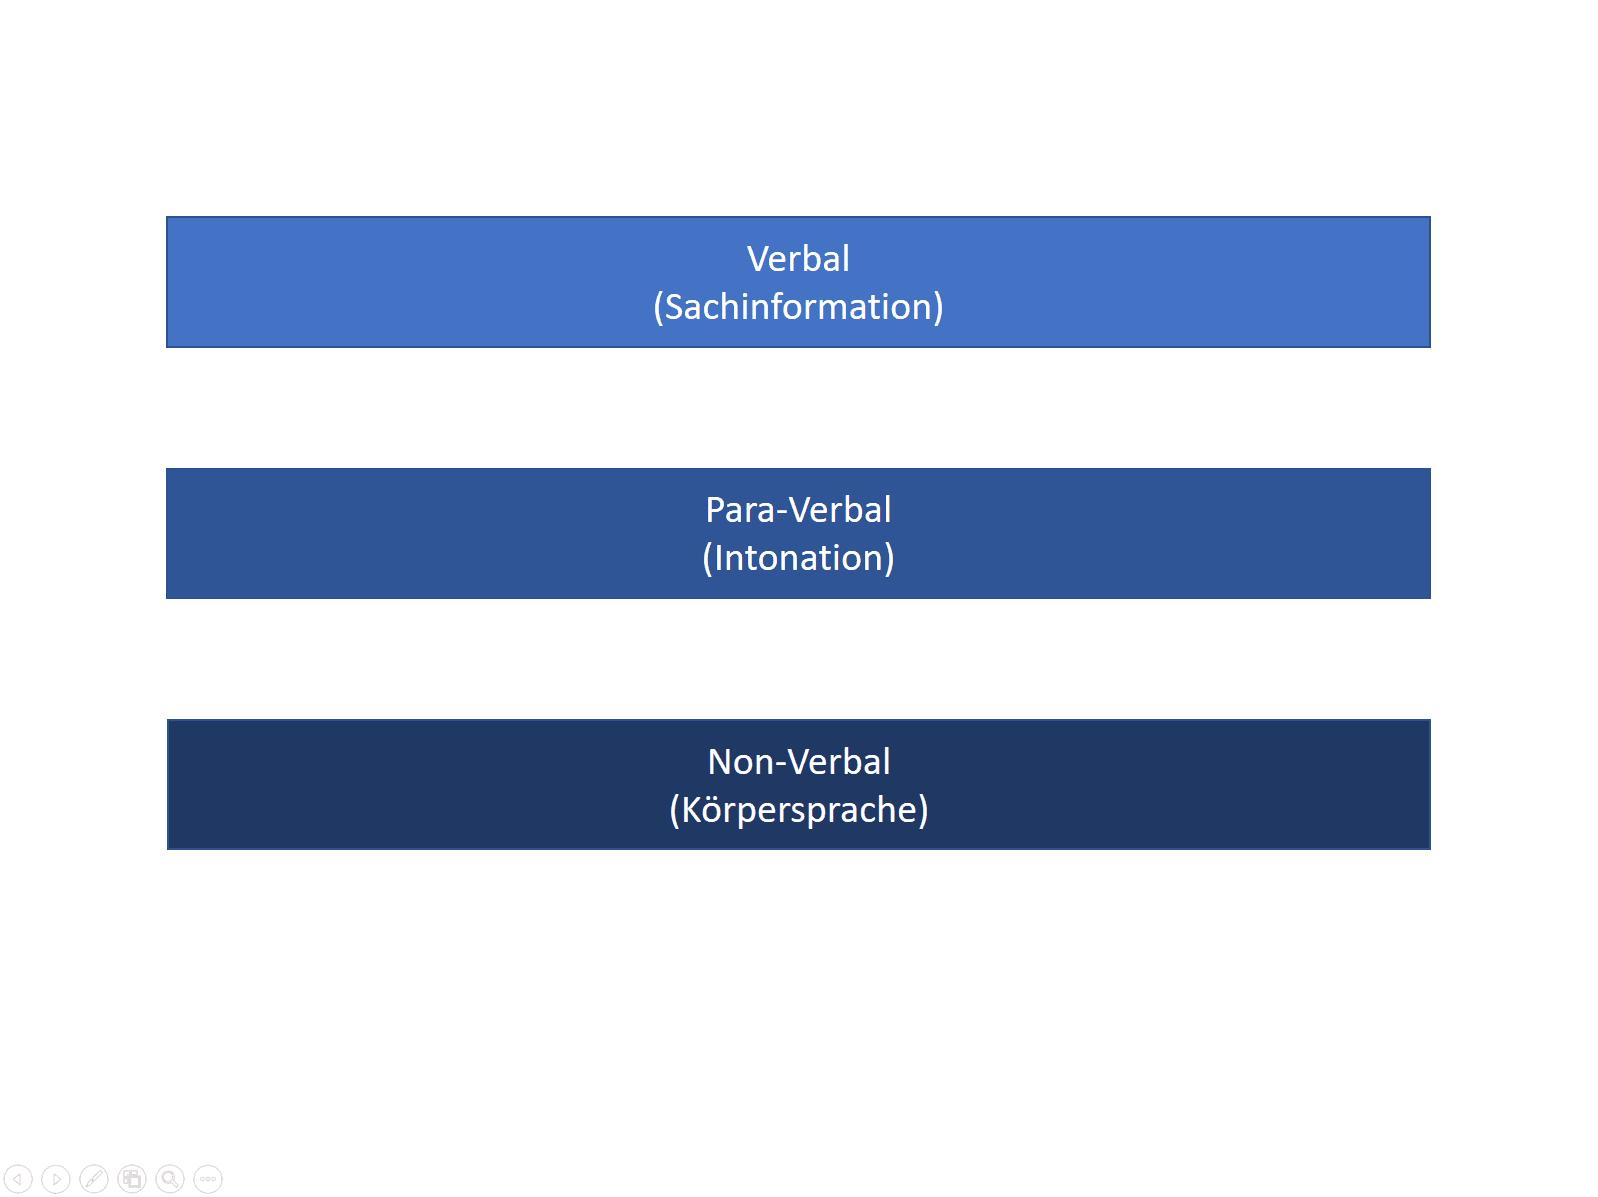 kommunikationsarten verbal para verbal non verbal